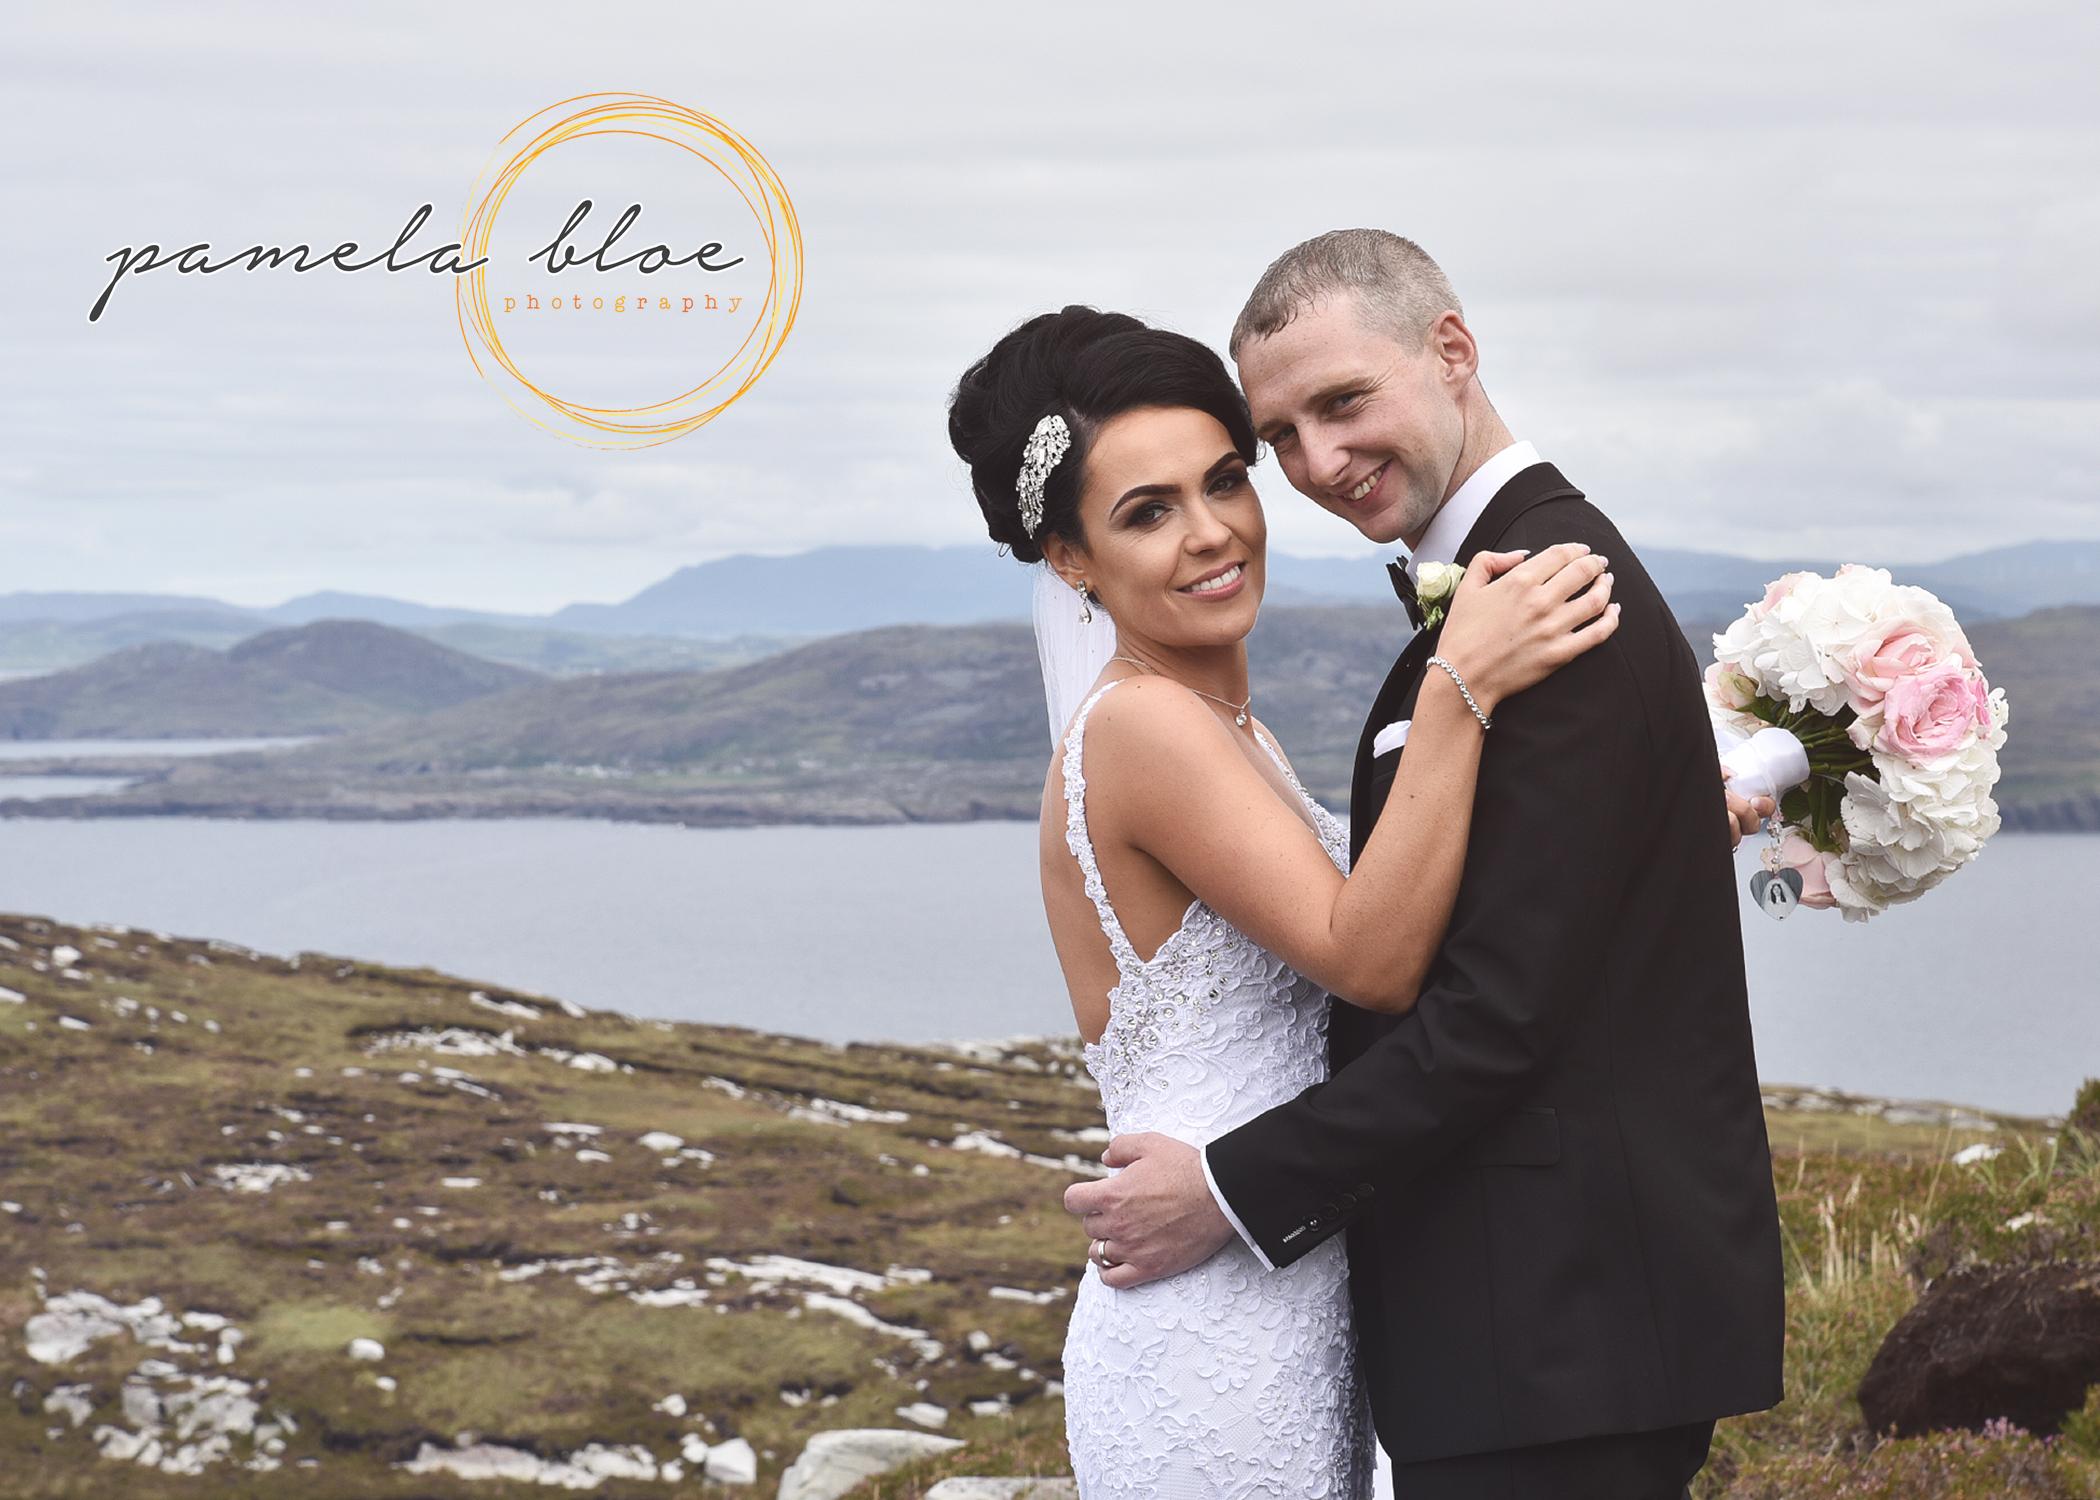 teambride-wedding-bride-groom-horn-head-photo-shoot